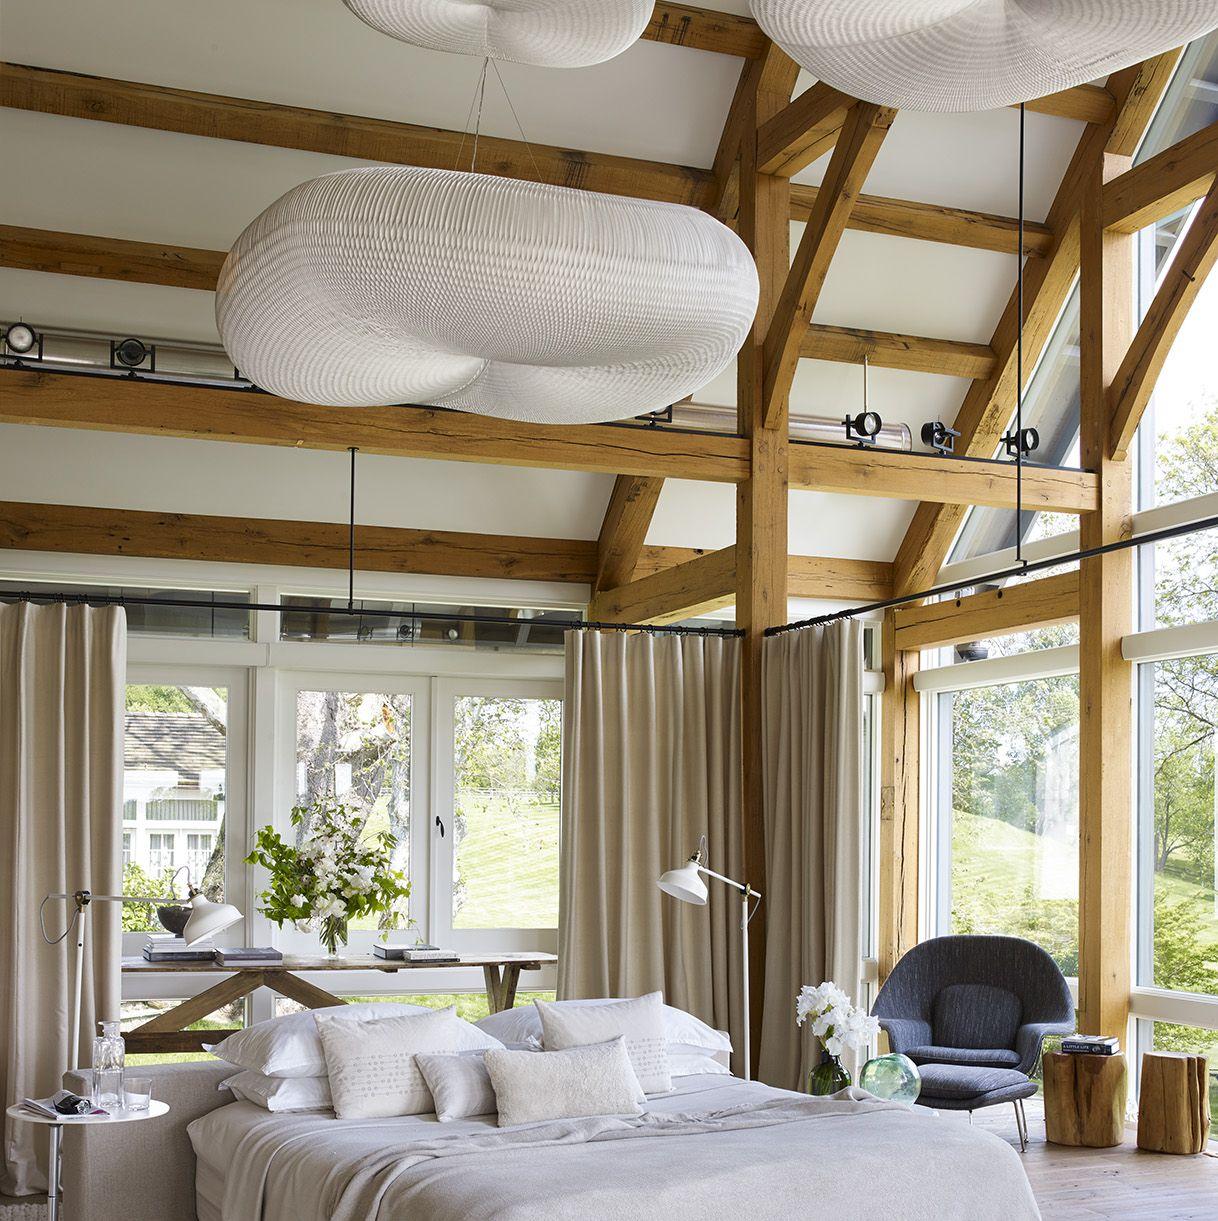 Decorated Bedroom Ideas 100+ bedroom decorating ideas & designs